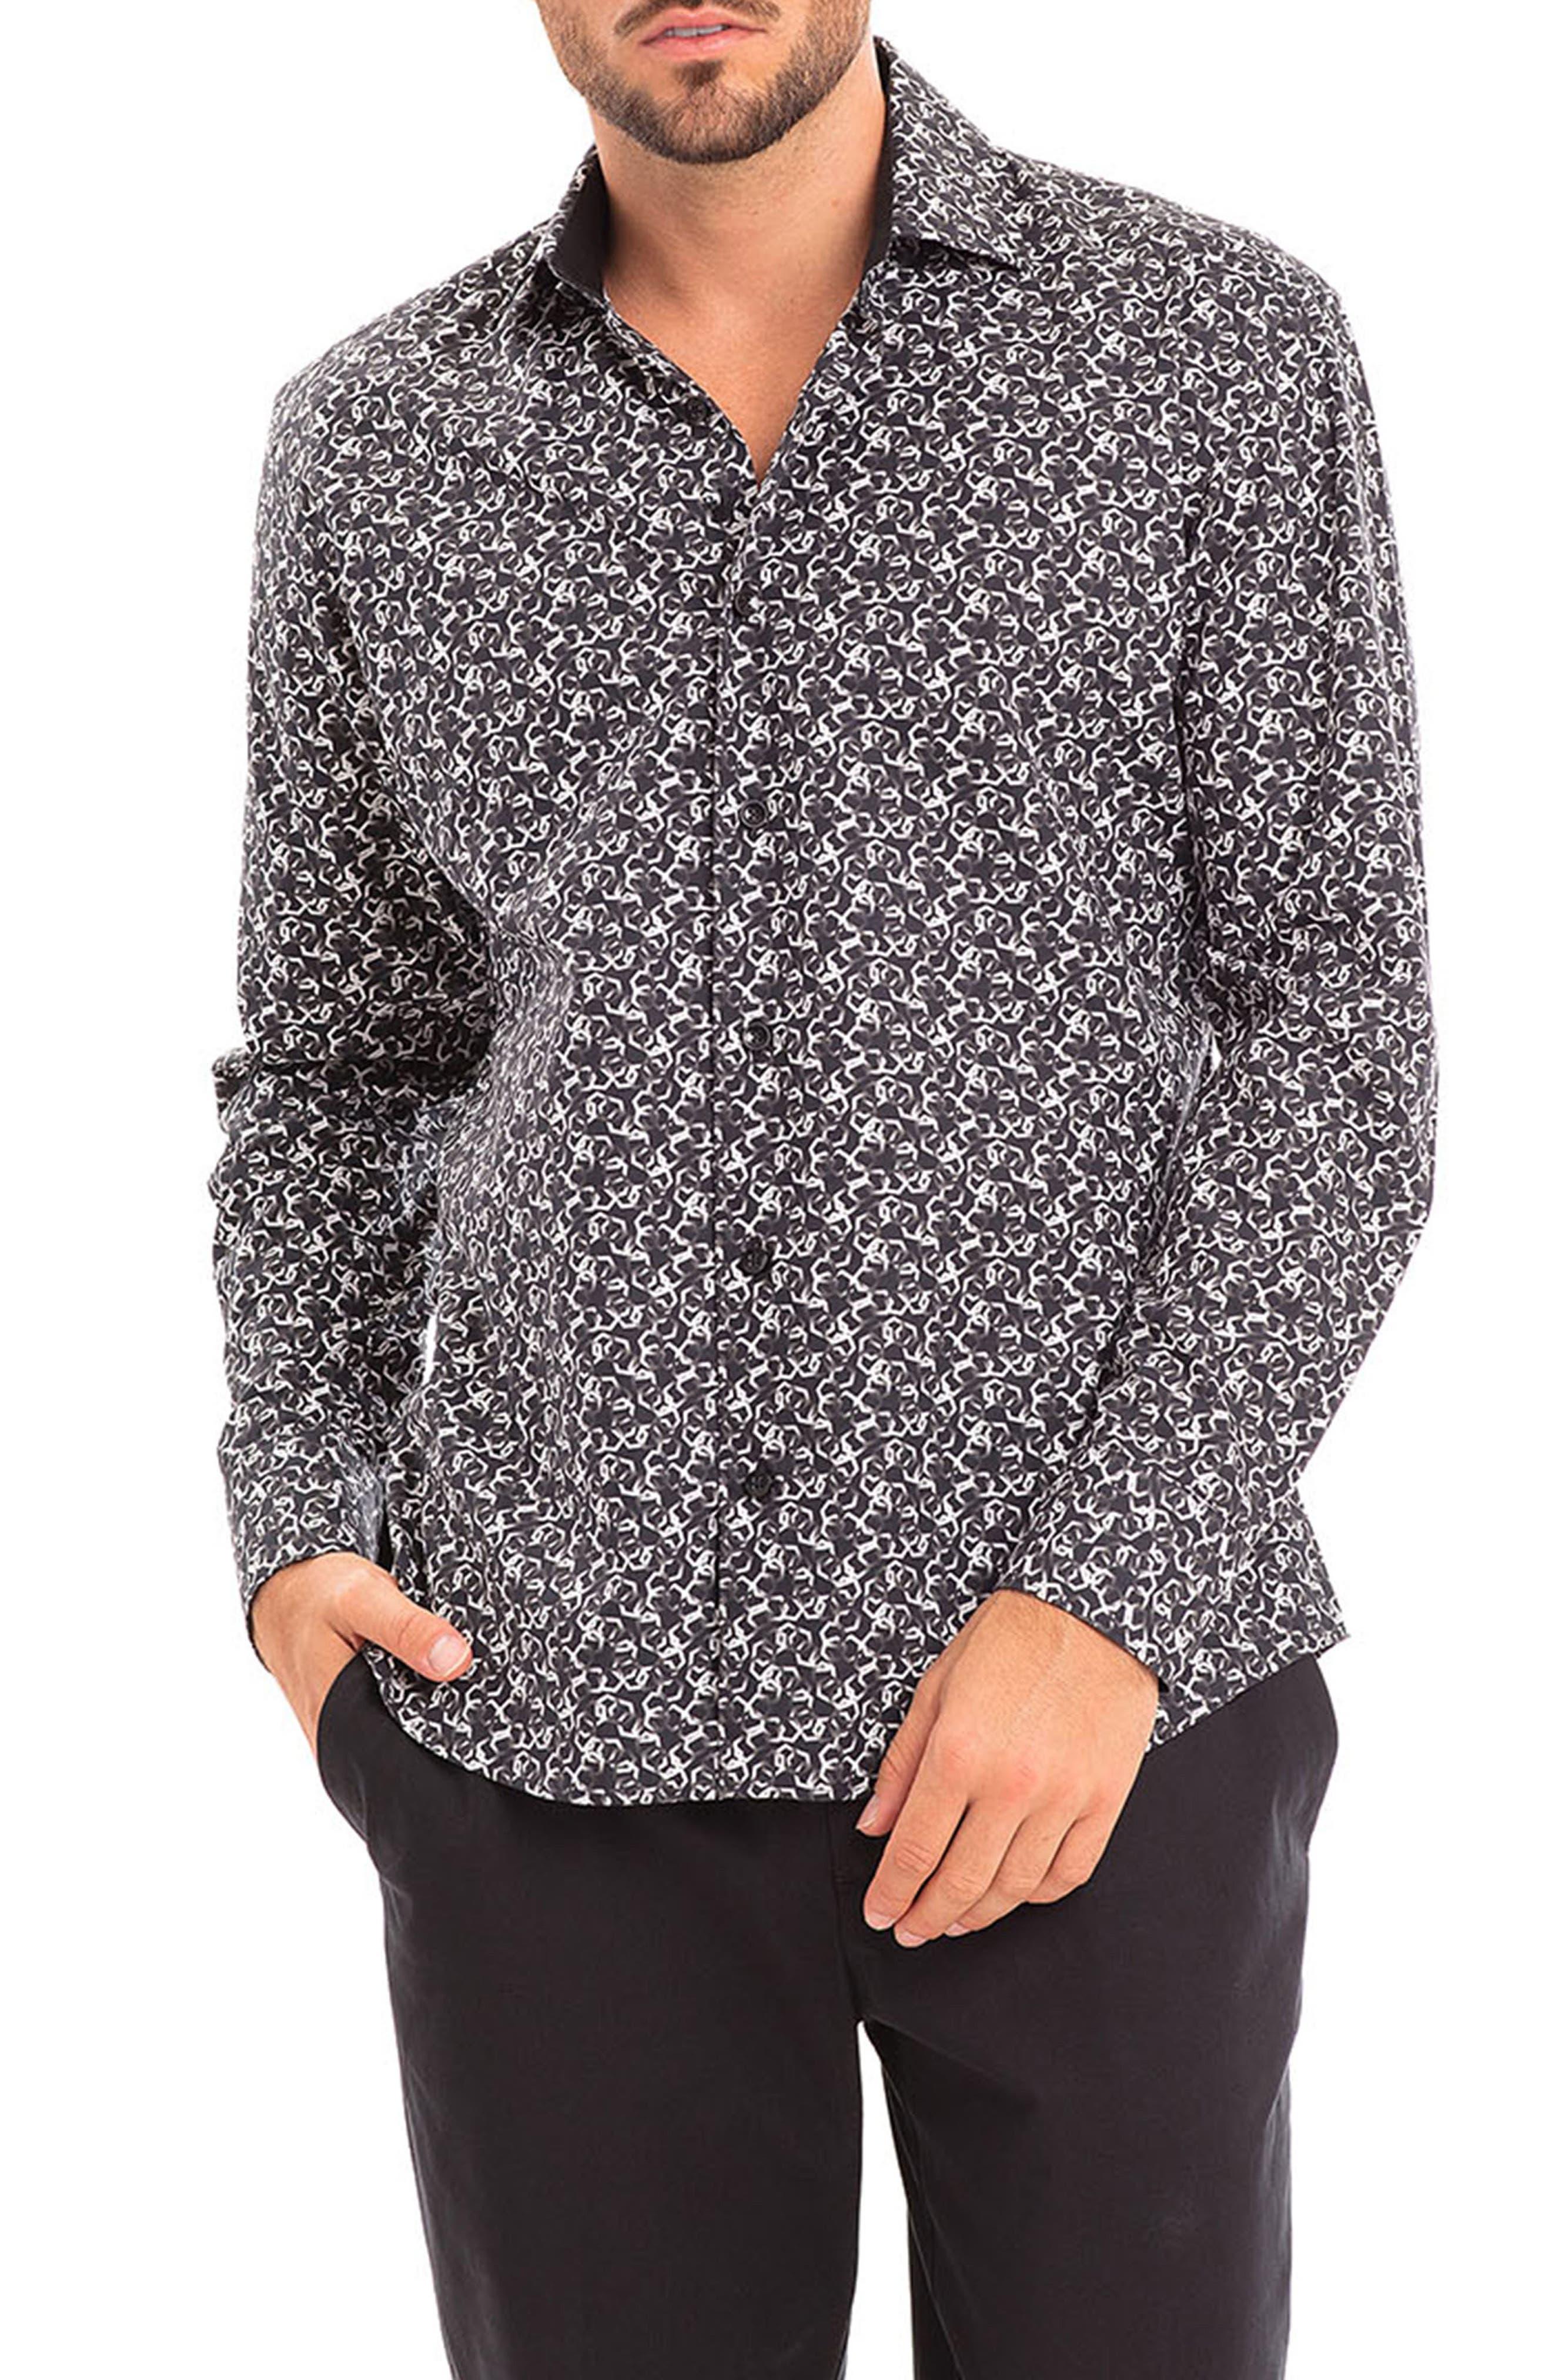 Titi Slim Fit Print Button-Up Shirt